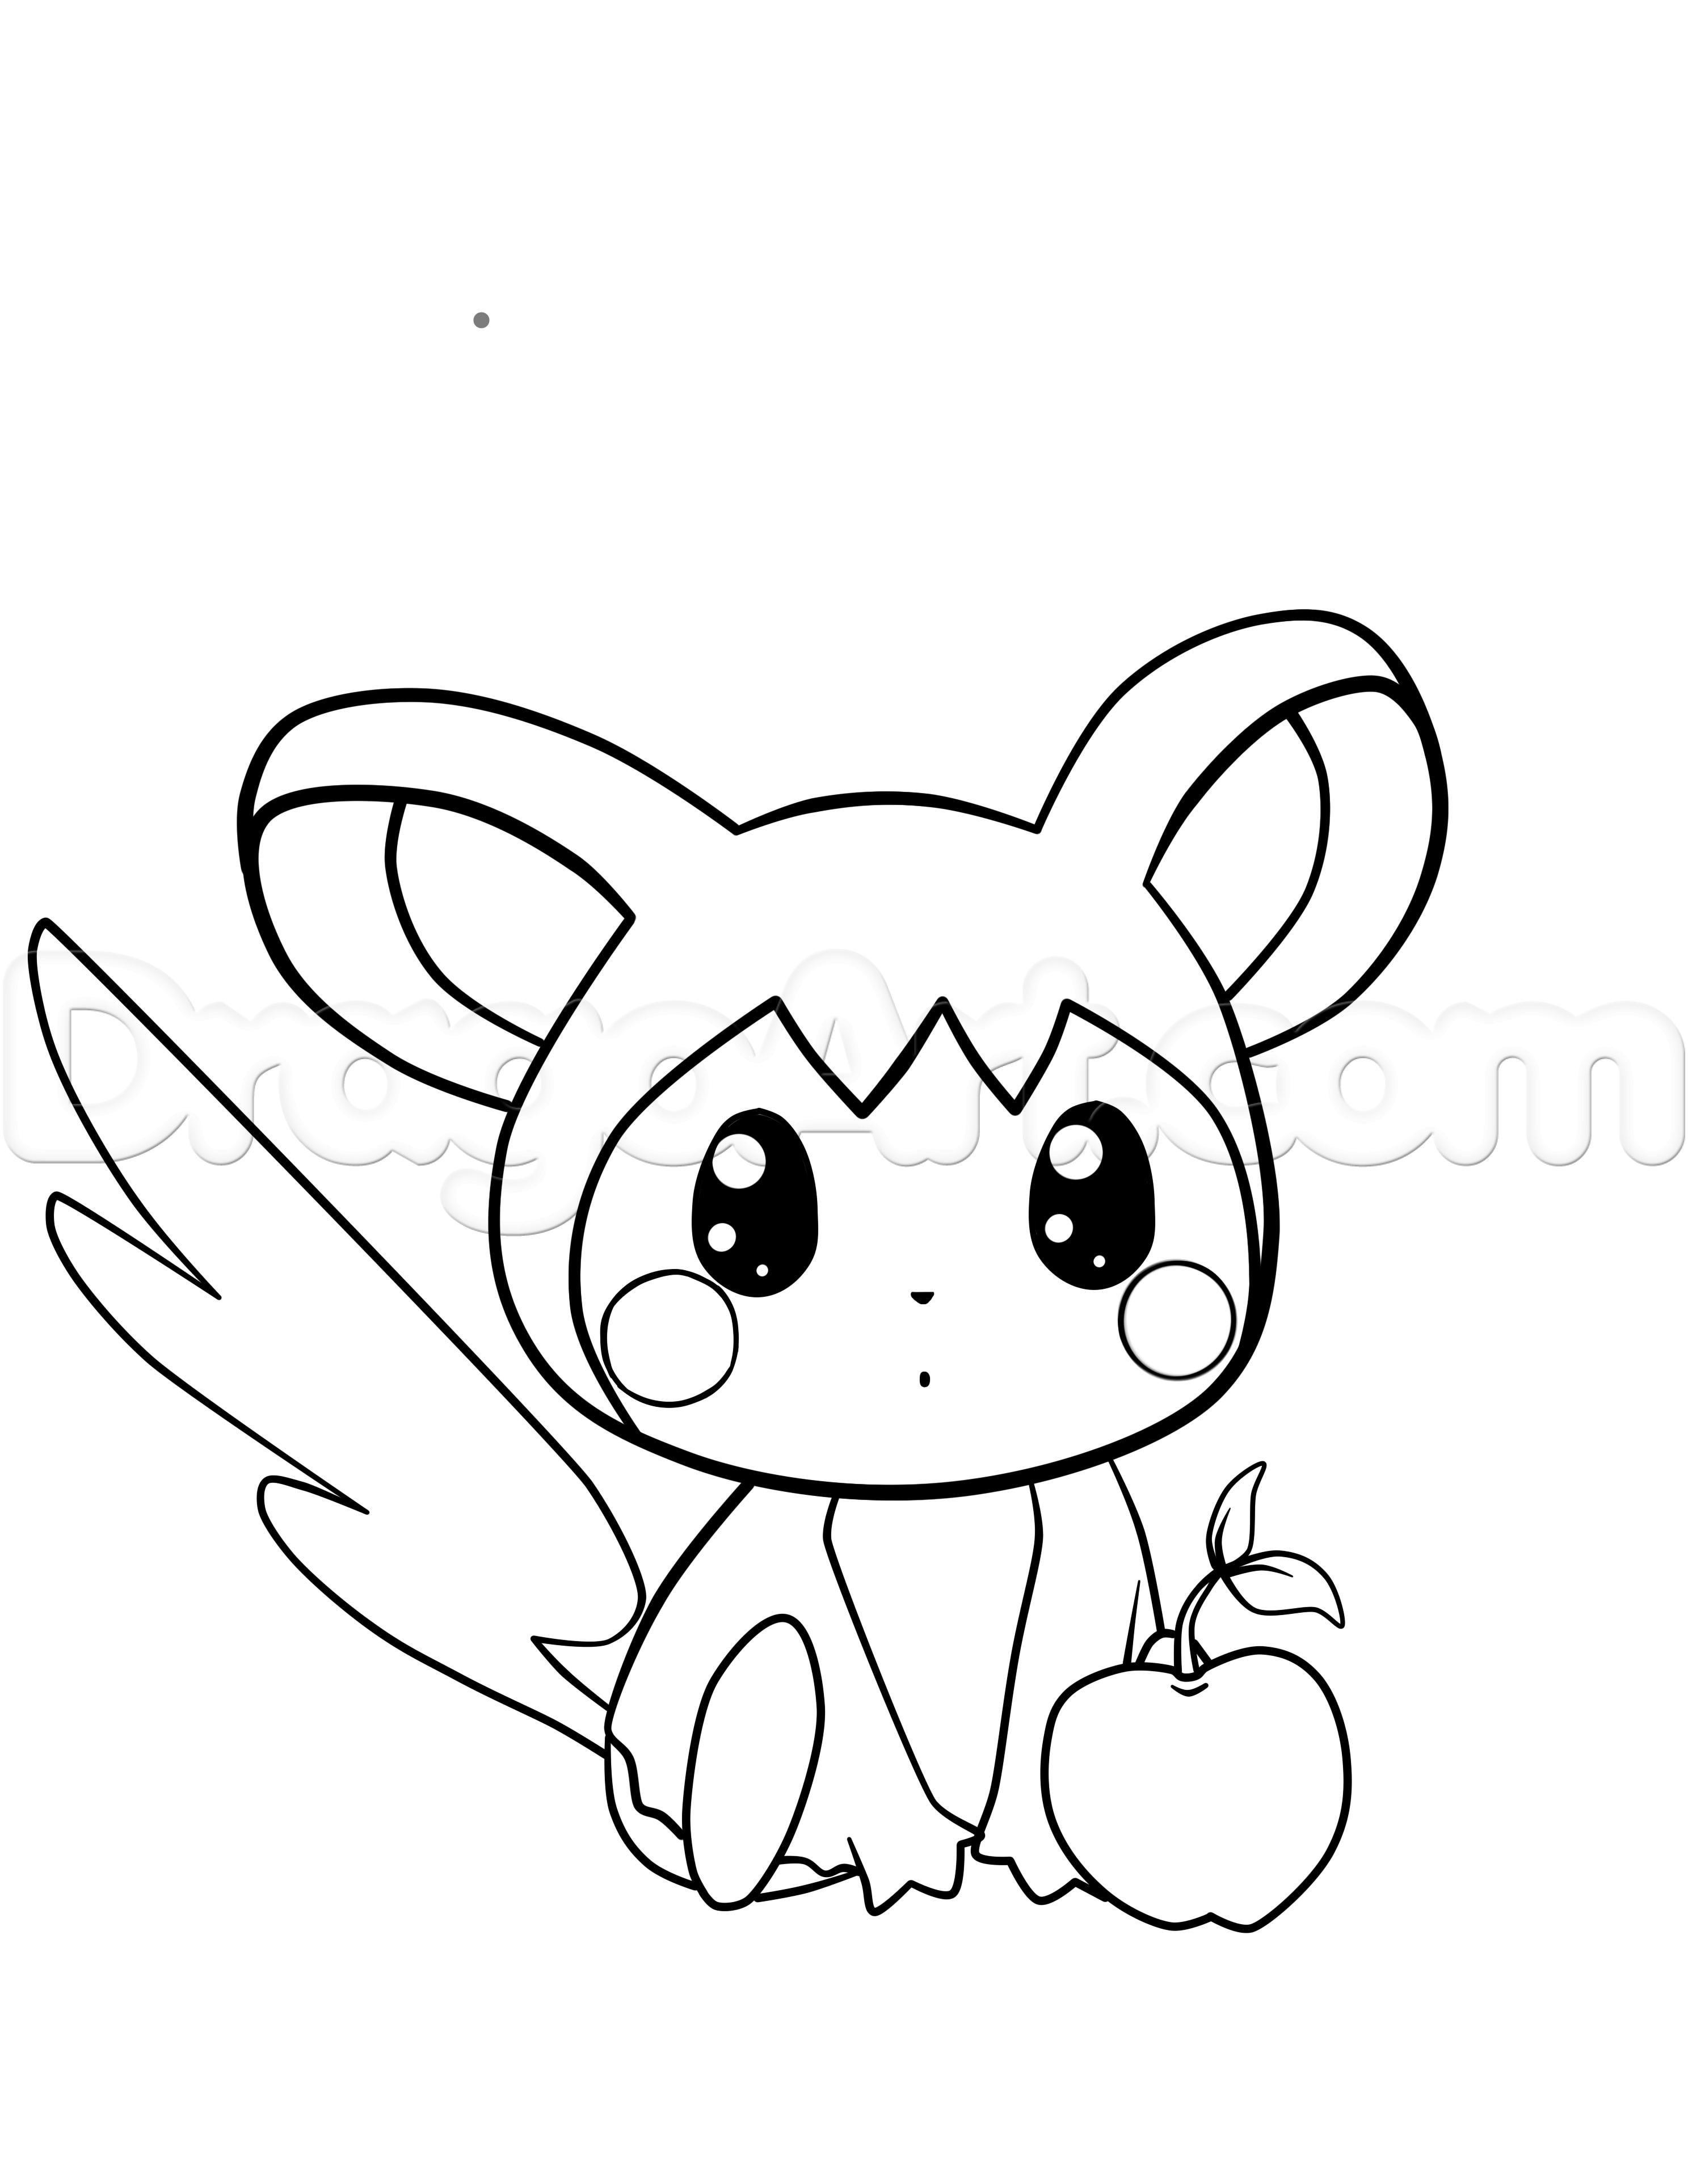 emolga pokemon coloring pages - photo#19